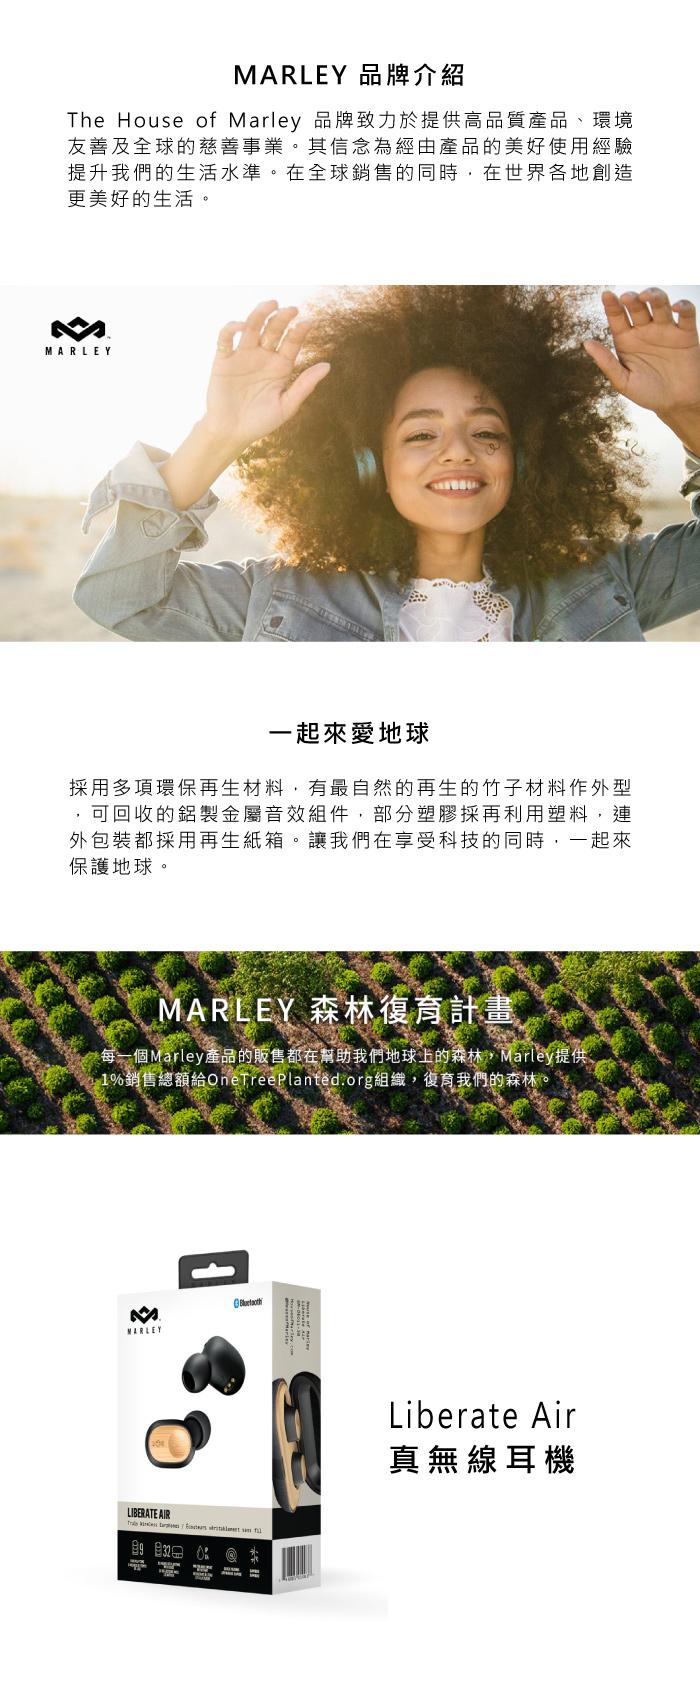 Marley|Liberate Air 真無線藍牙耳機